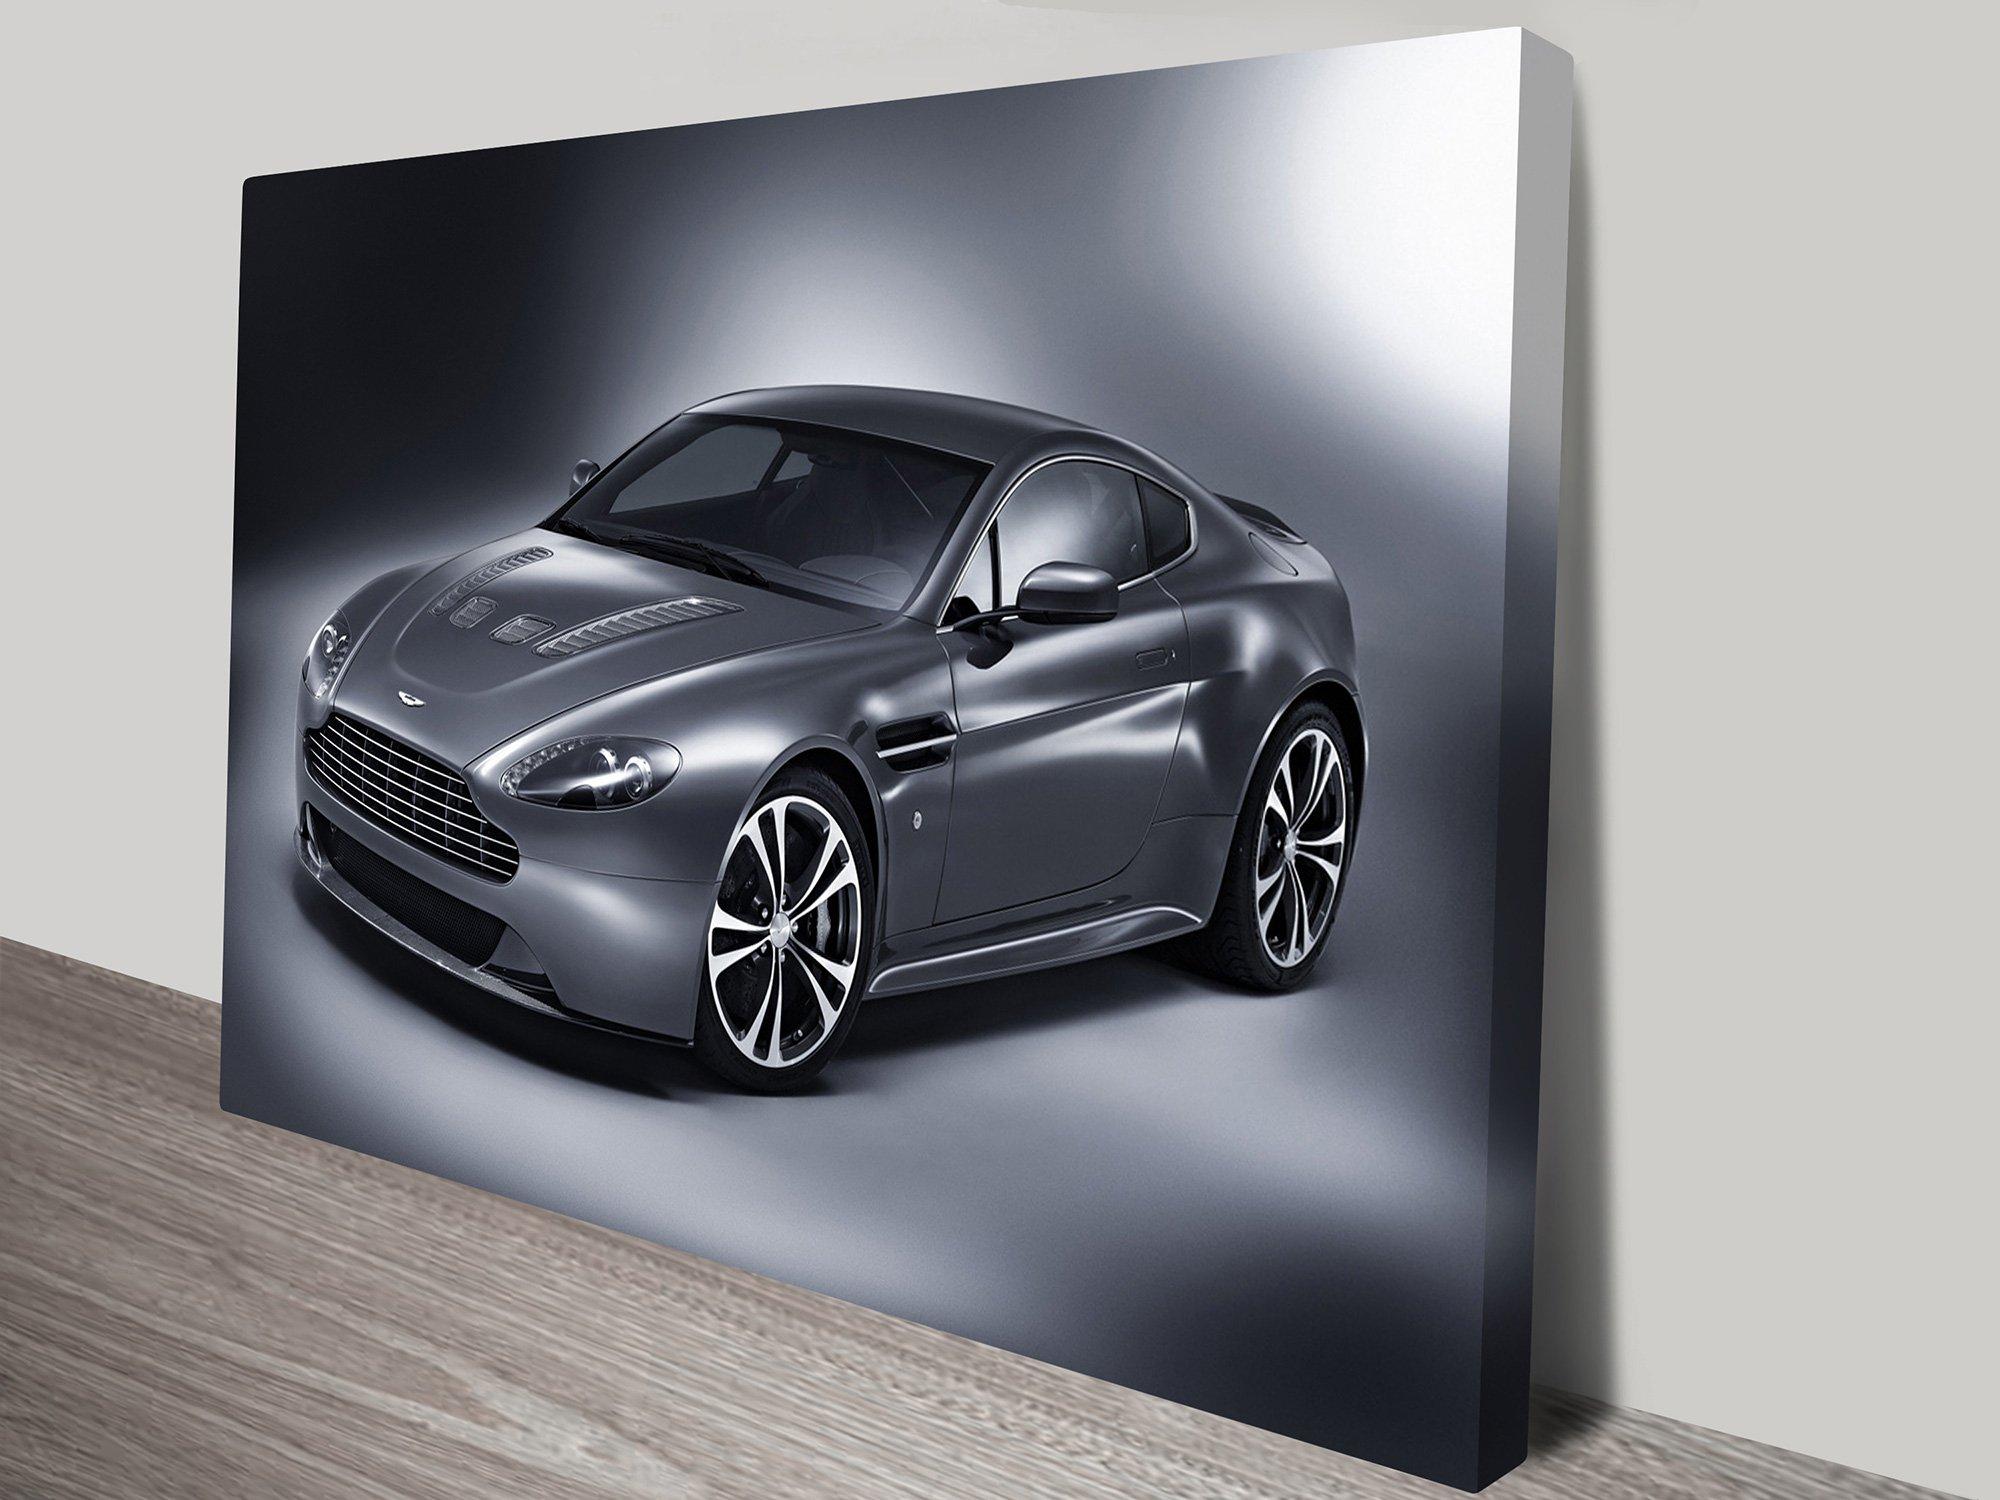 Aston Martin V12 Print on Canvas